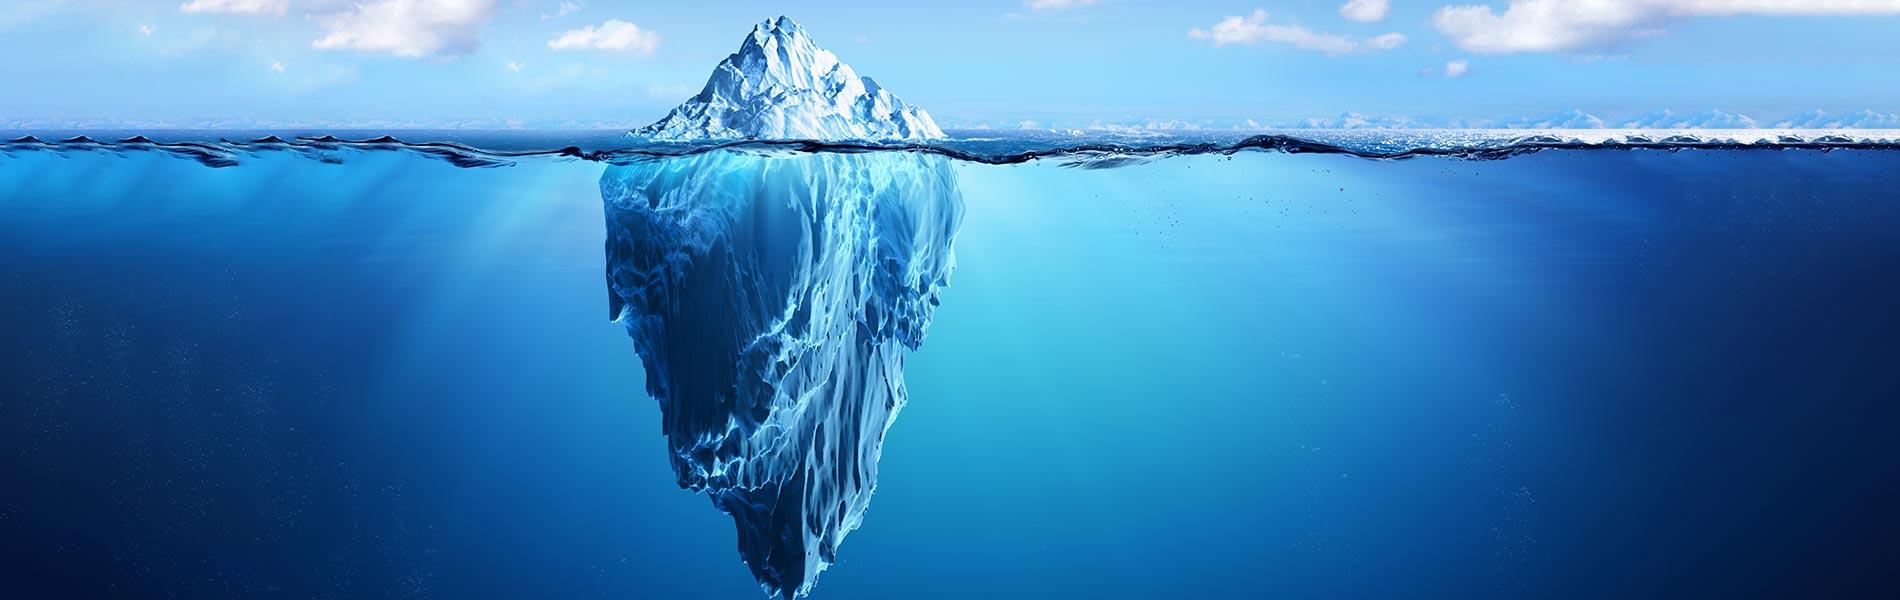 CRM is like an iceberg